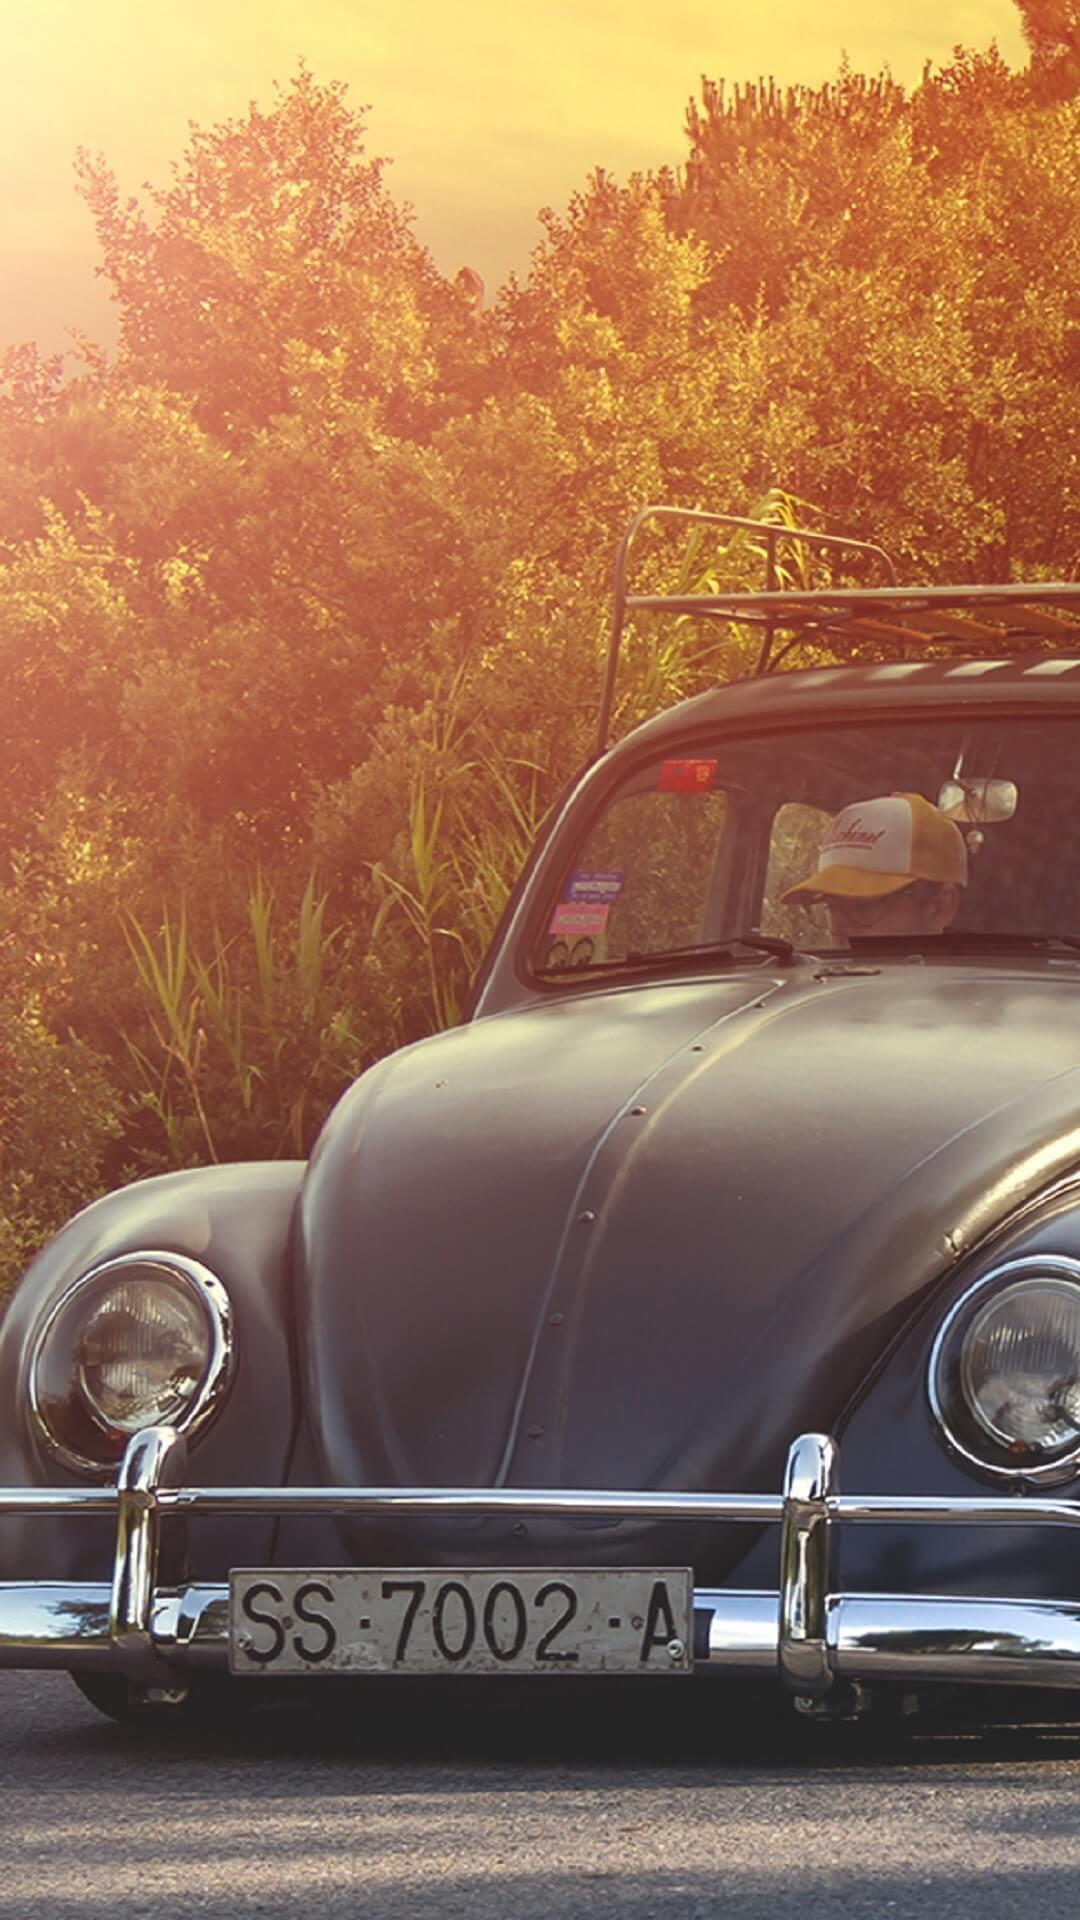 صور صور سيارات قديمه